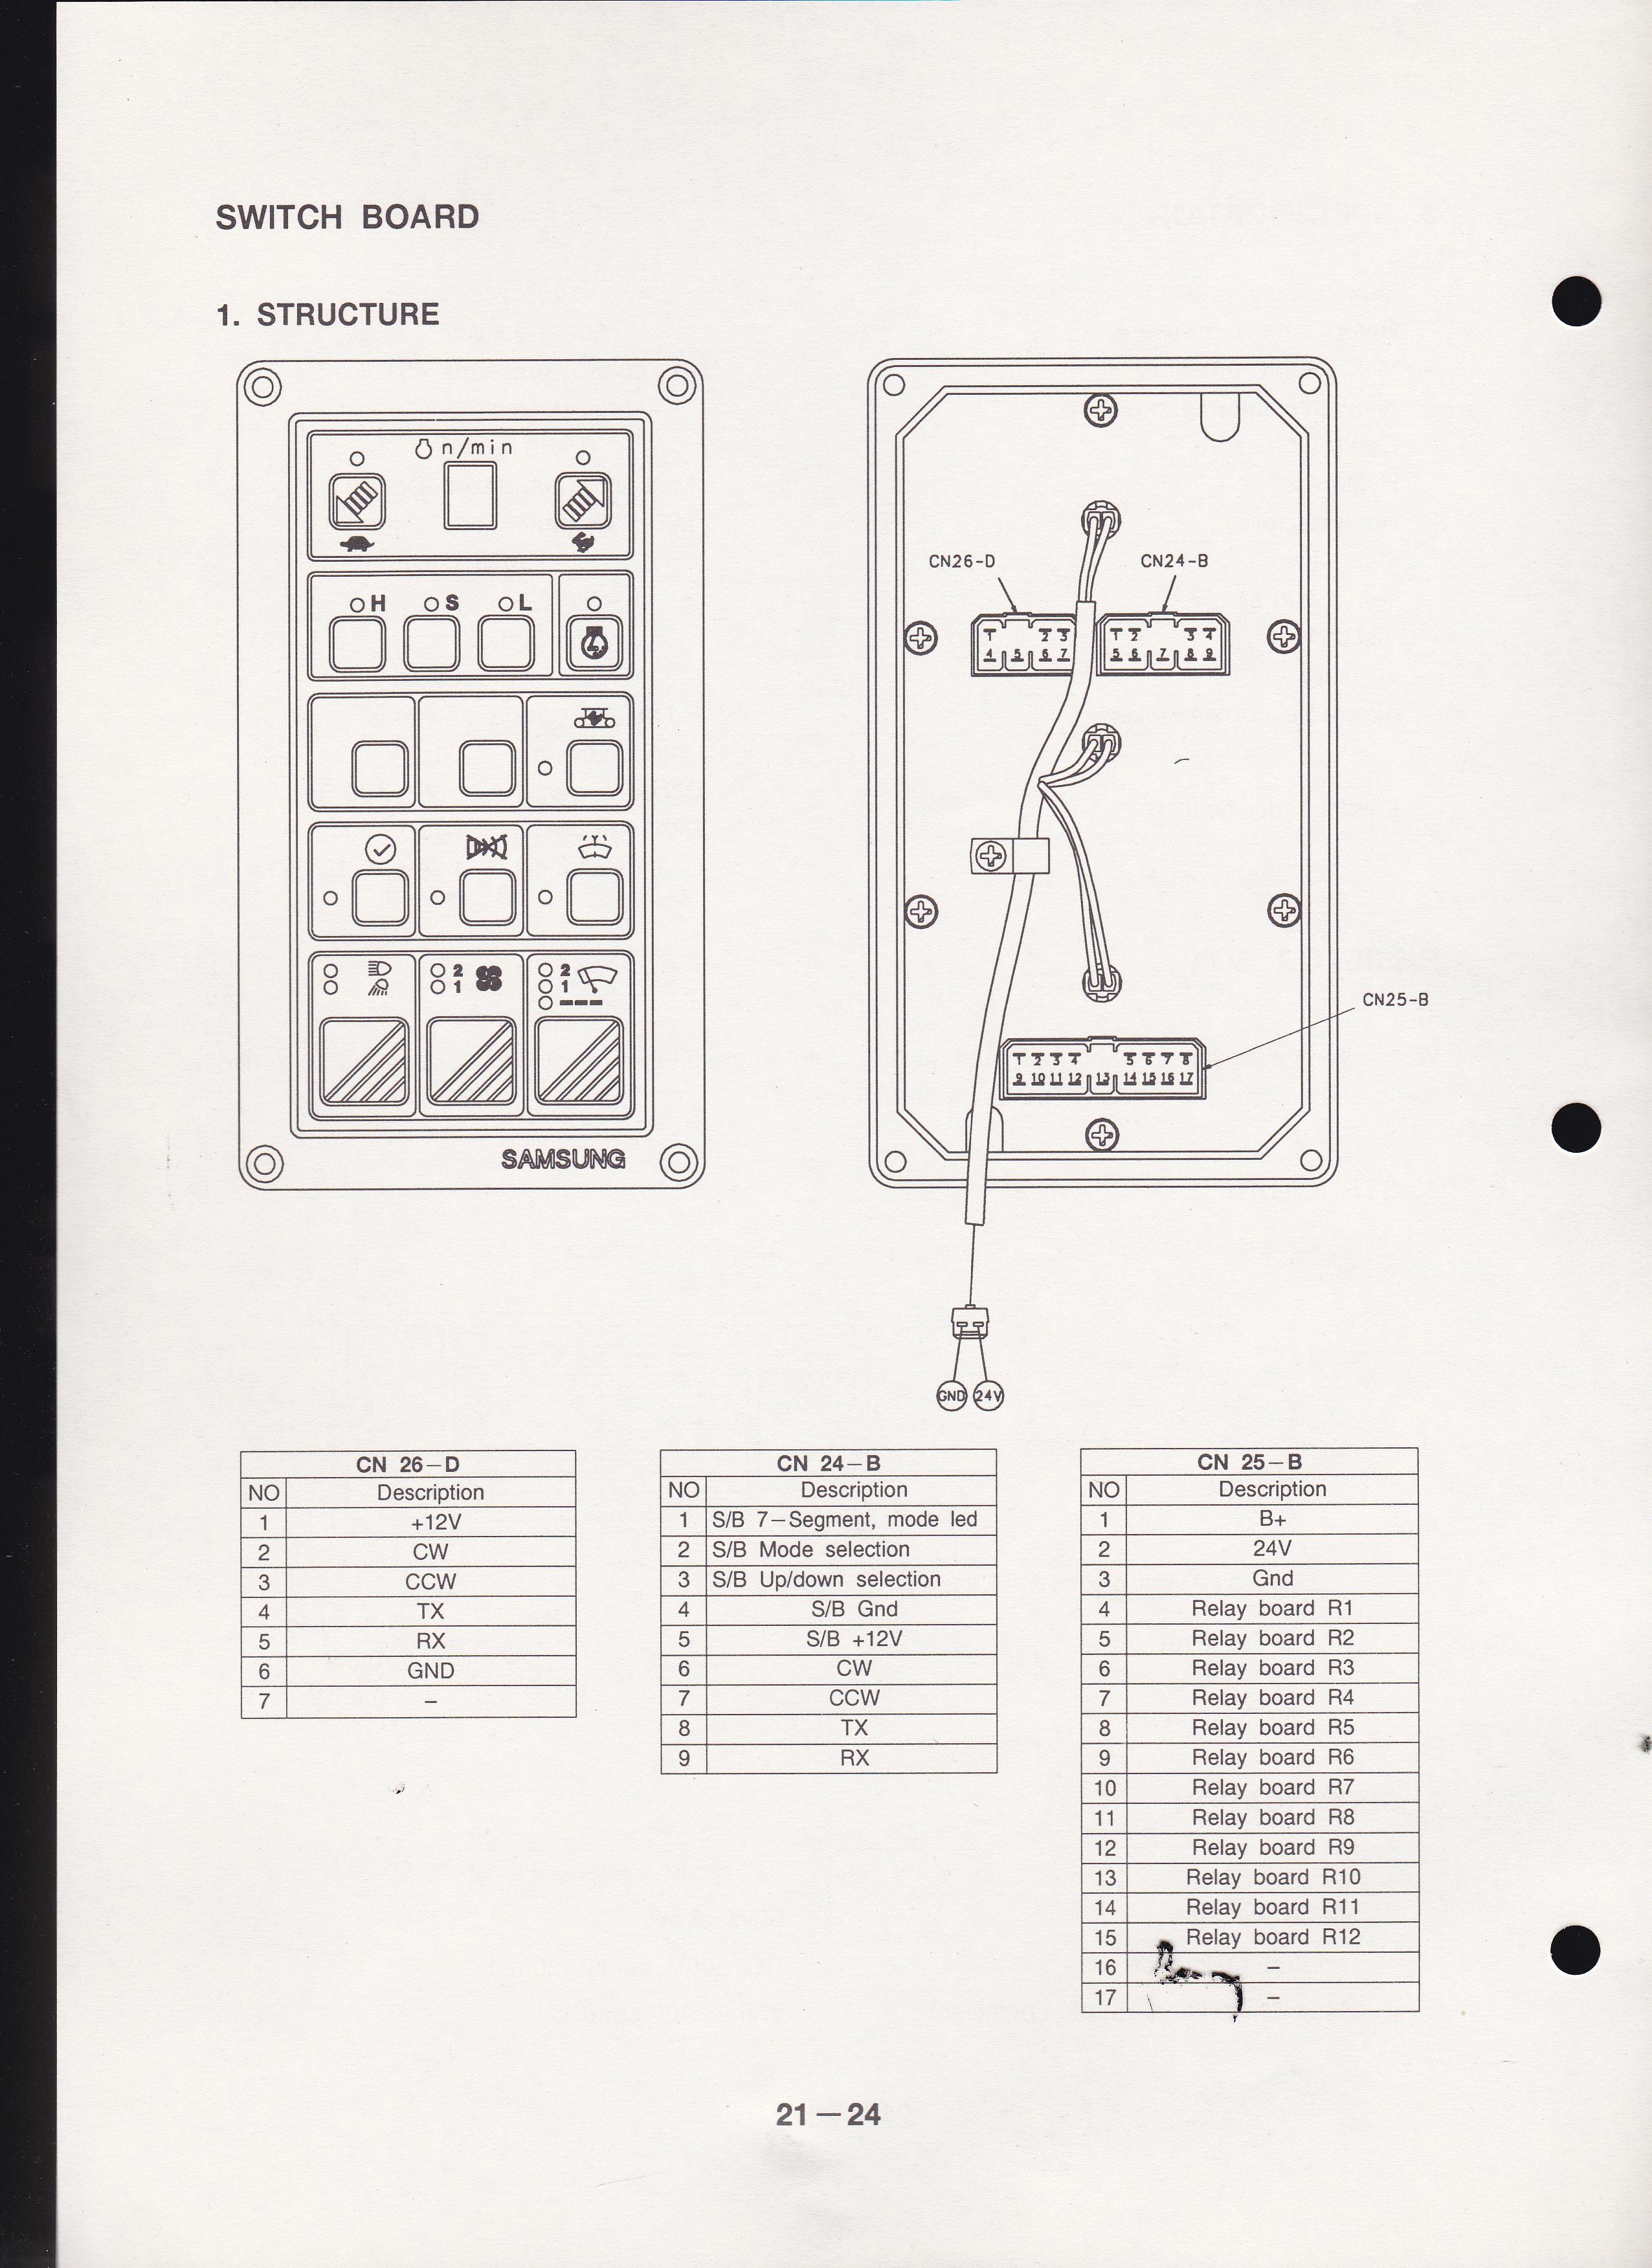 Volvo L20b Wiring Diagram - Center Wiring Diagram car-external -  car-external.iosonointersex.it | Volvo L20b Wiring Diagram |  | Io sono Intersex